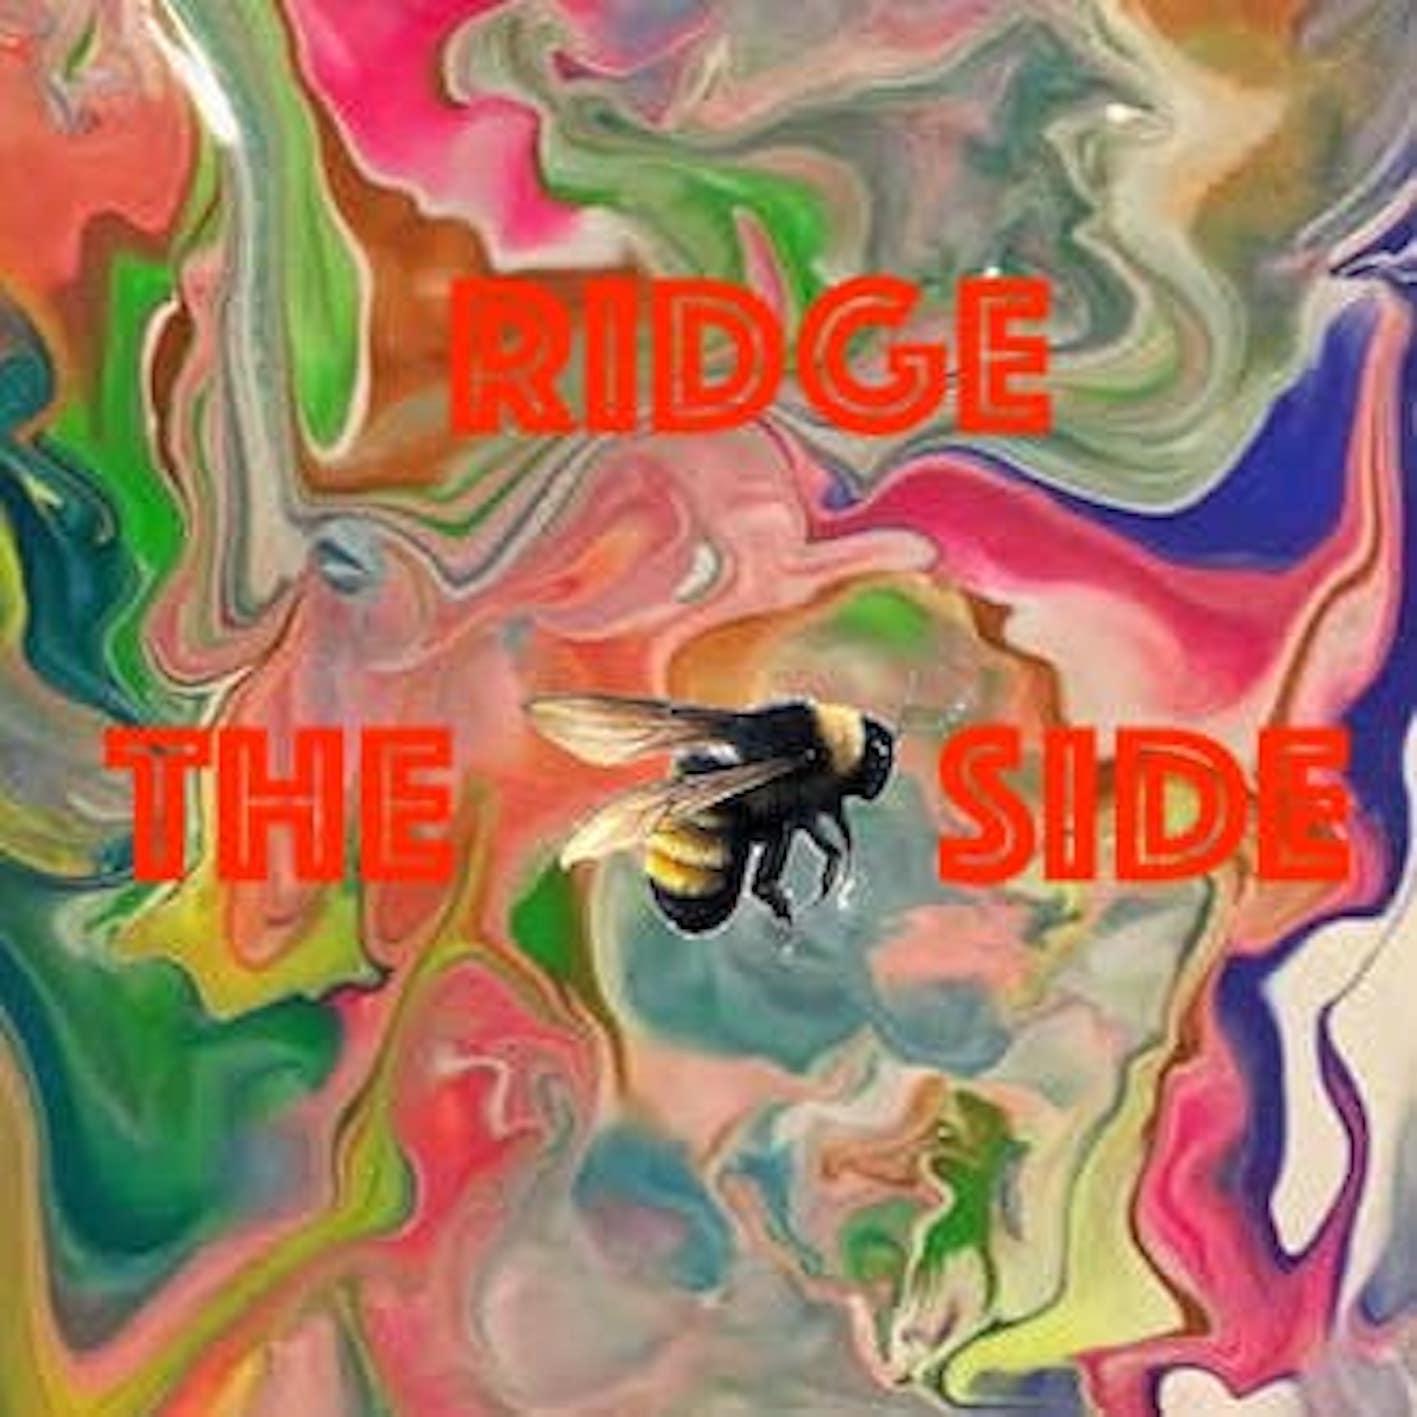 RIDGE - THE BEE SIDE